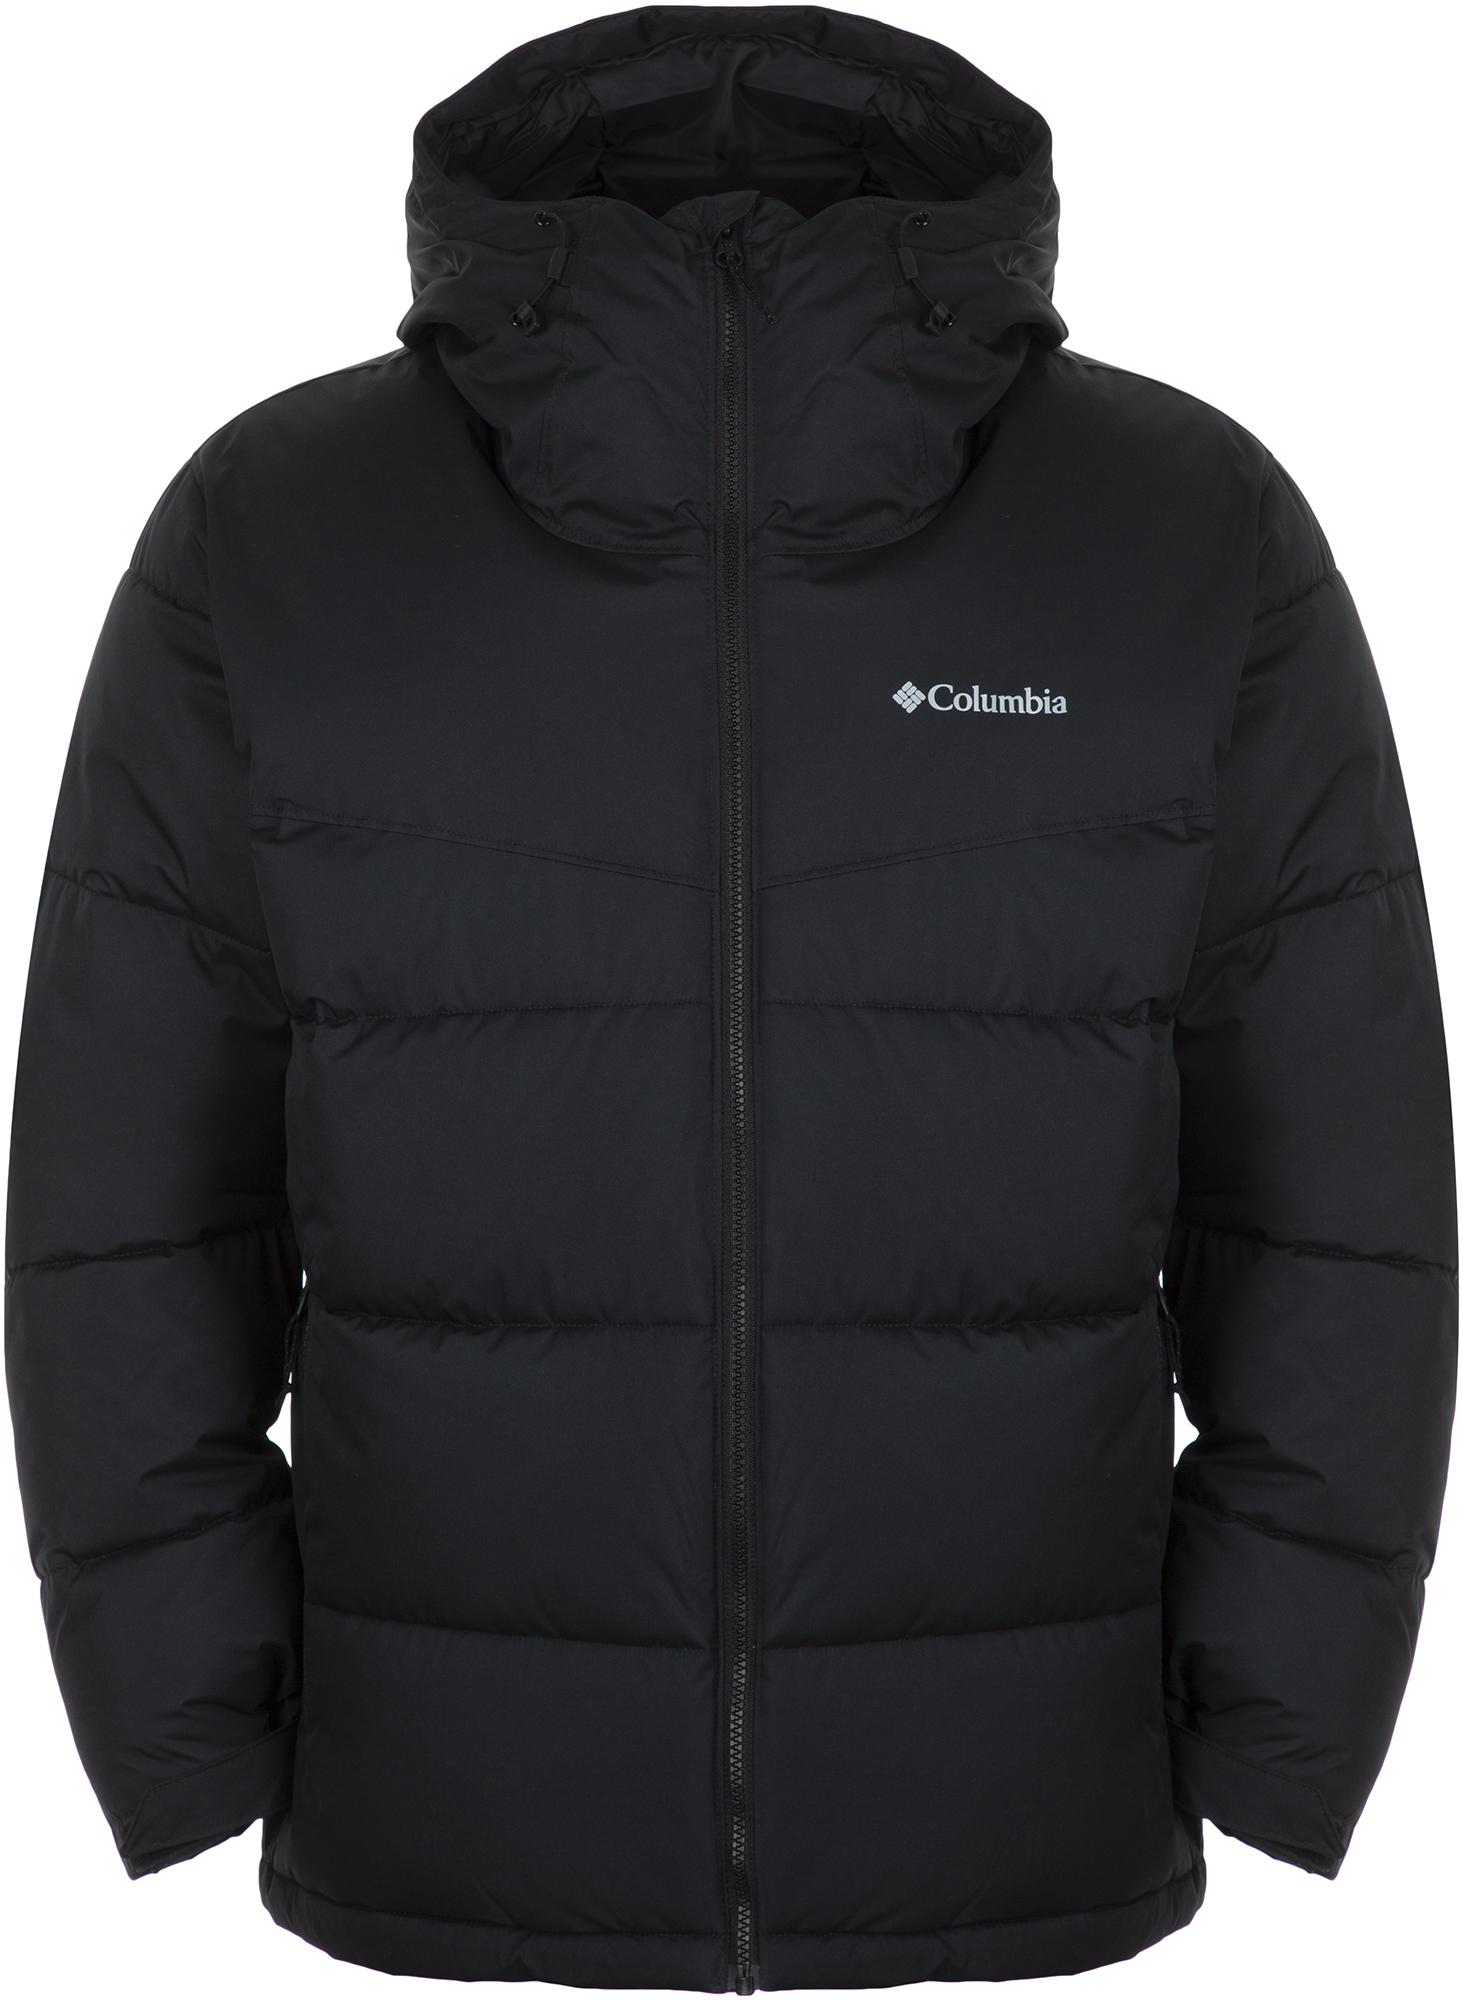 Columbia Куртка утепленная мужская Iceline Ridge, размер 54